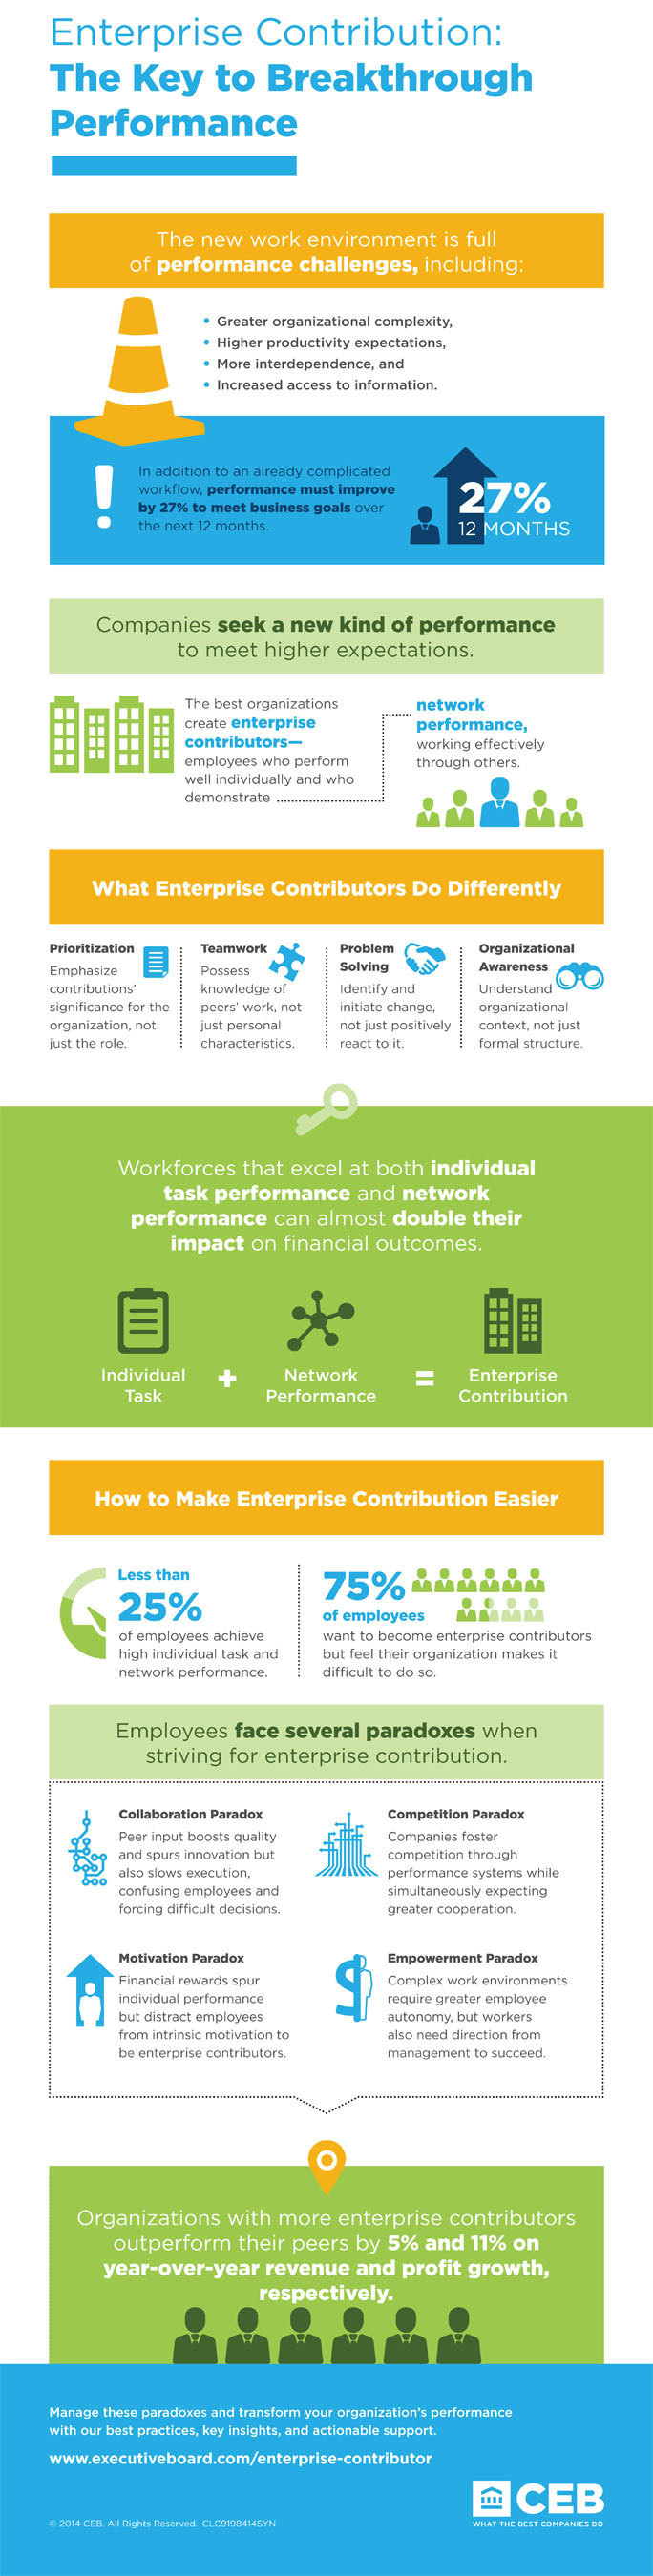 Infographic: Enterprise Contributors-The Key to Breakthrough Performance